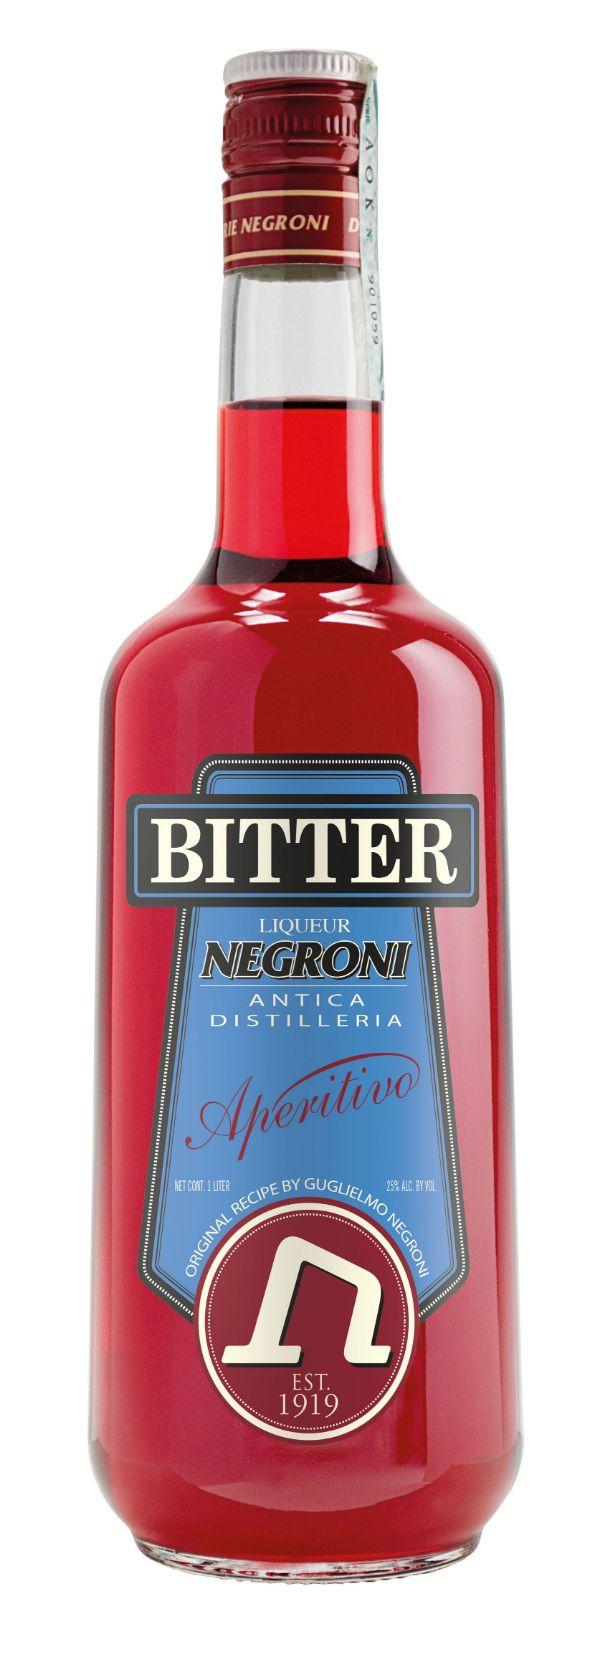 Distillery Negroni Bitter Aperitivo Liqueur